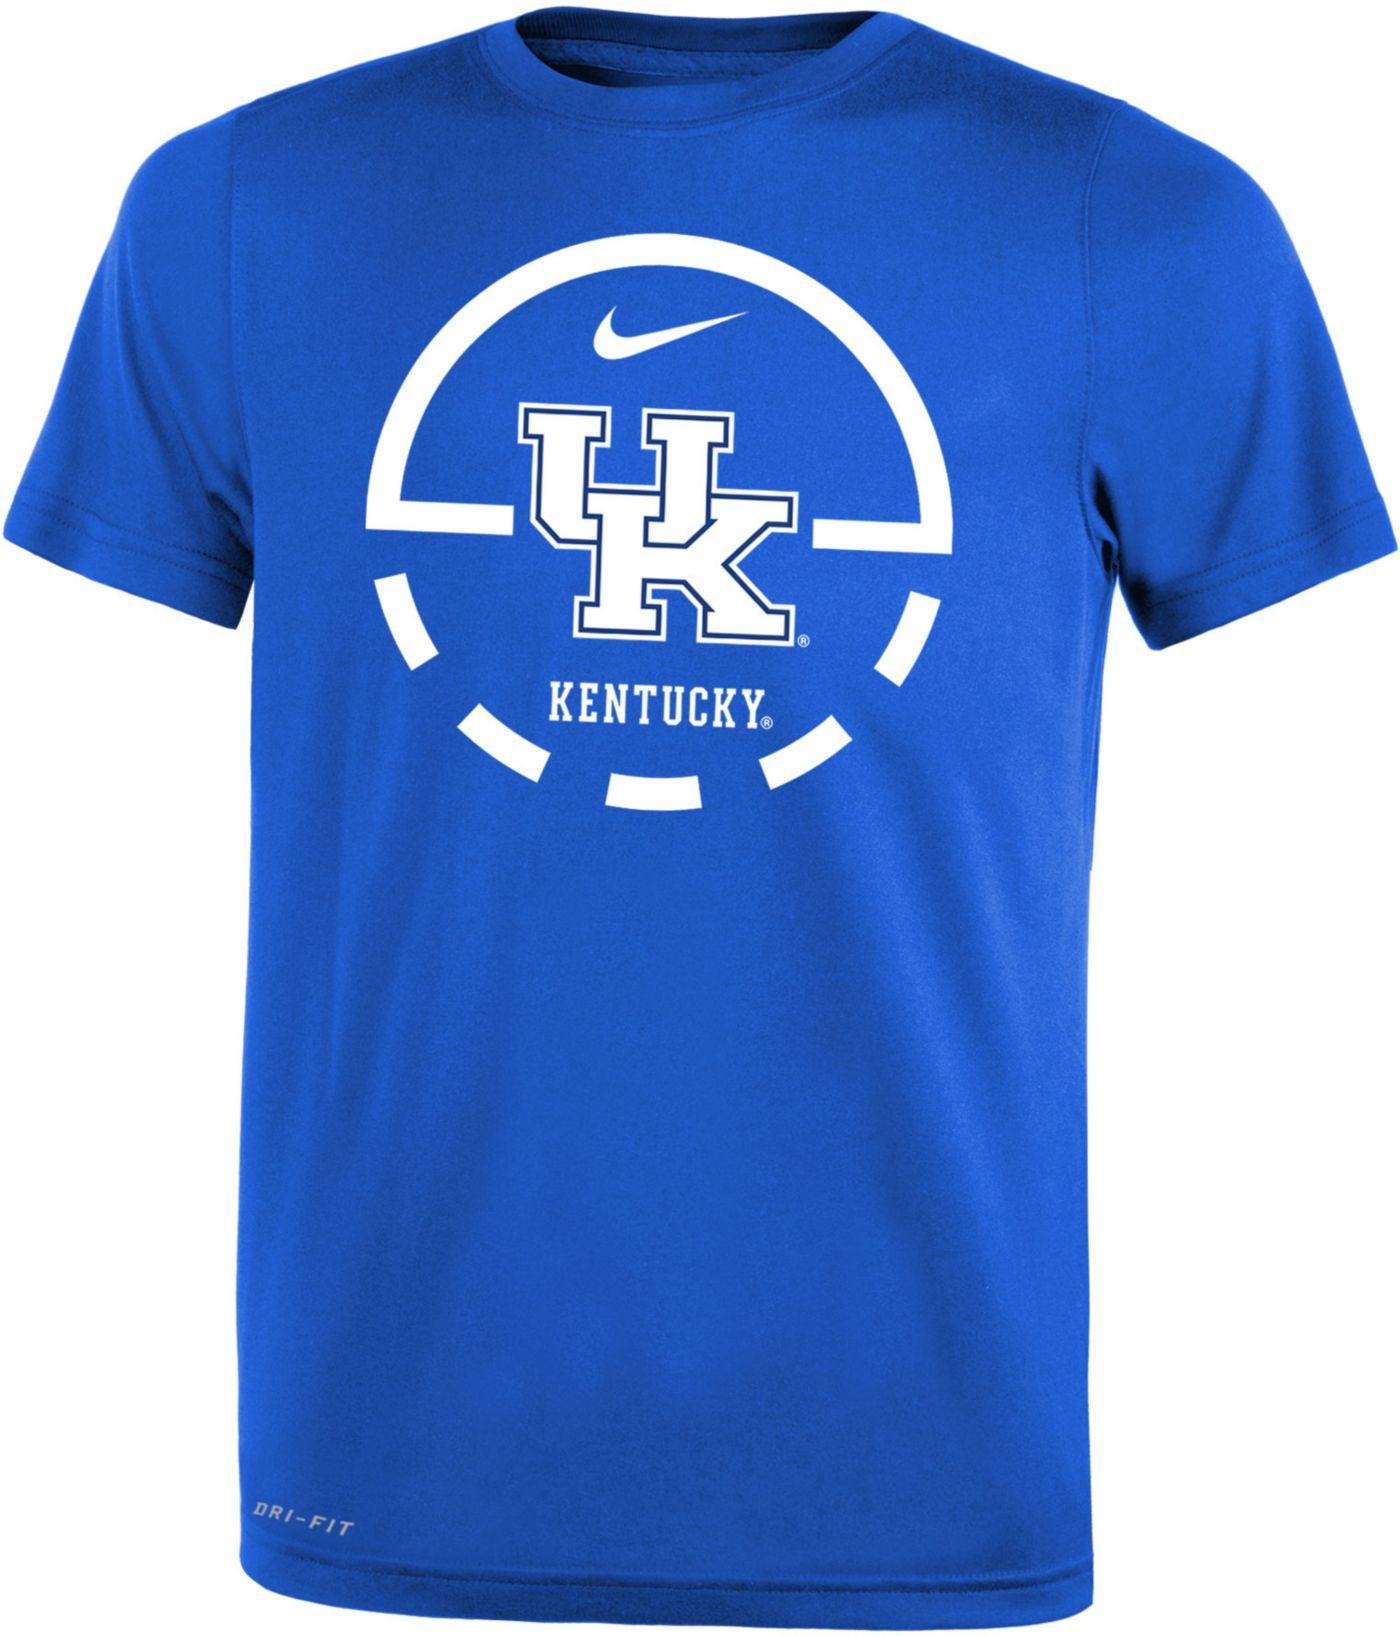 Nike Youth Kentucky Wildcats Blue Legend Basketball Key T-Shirt